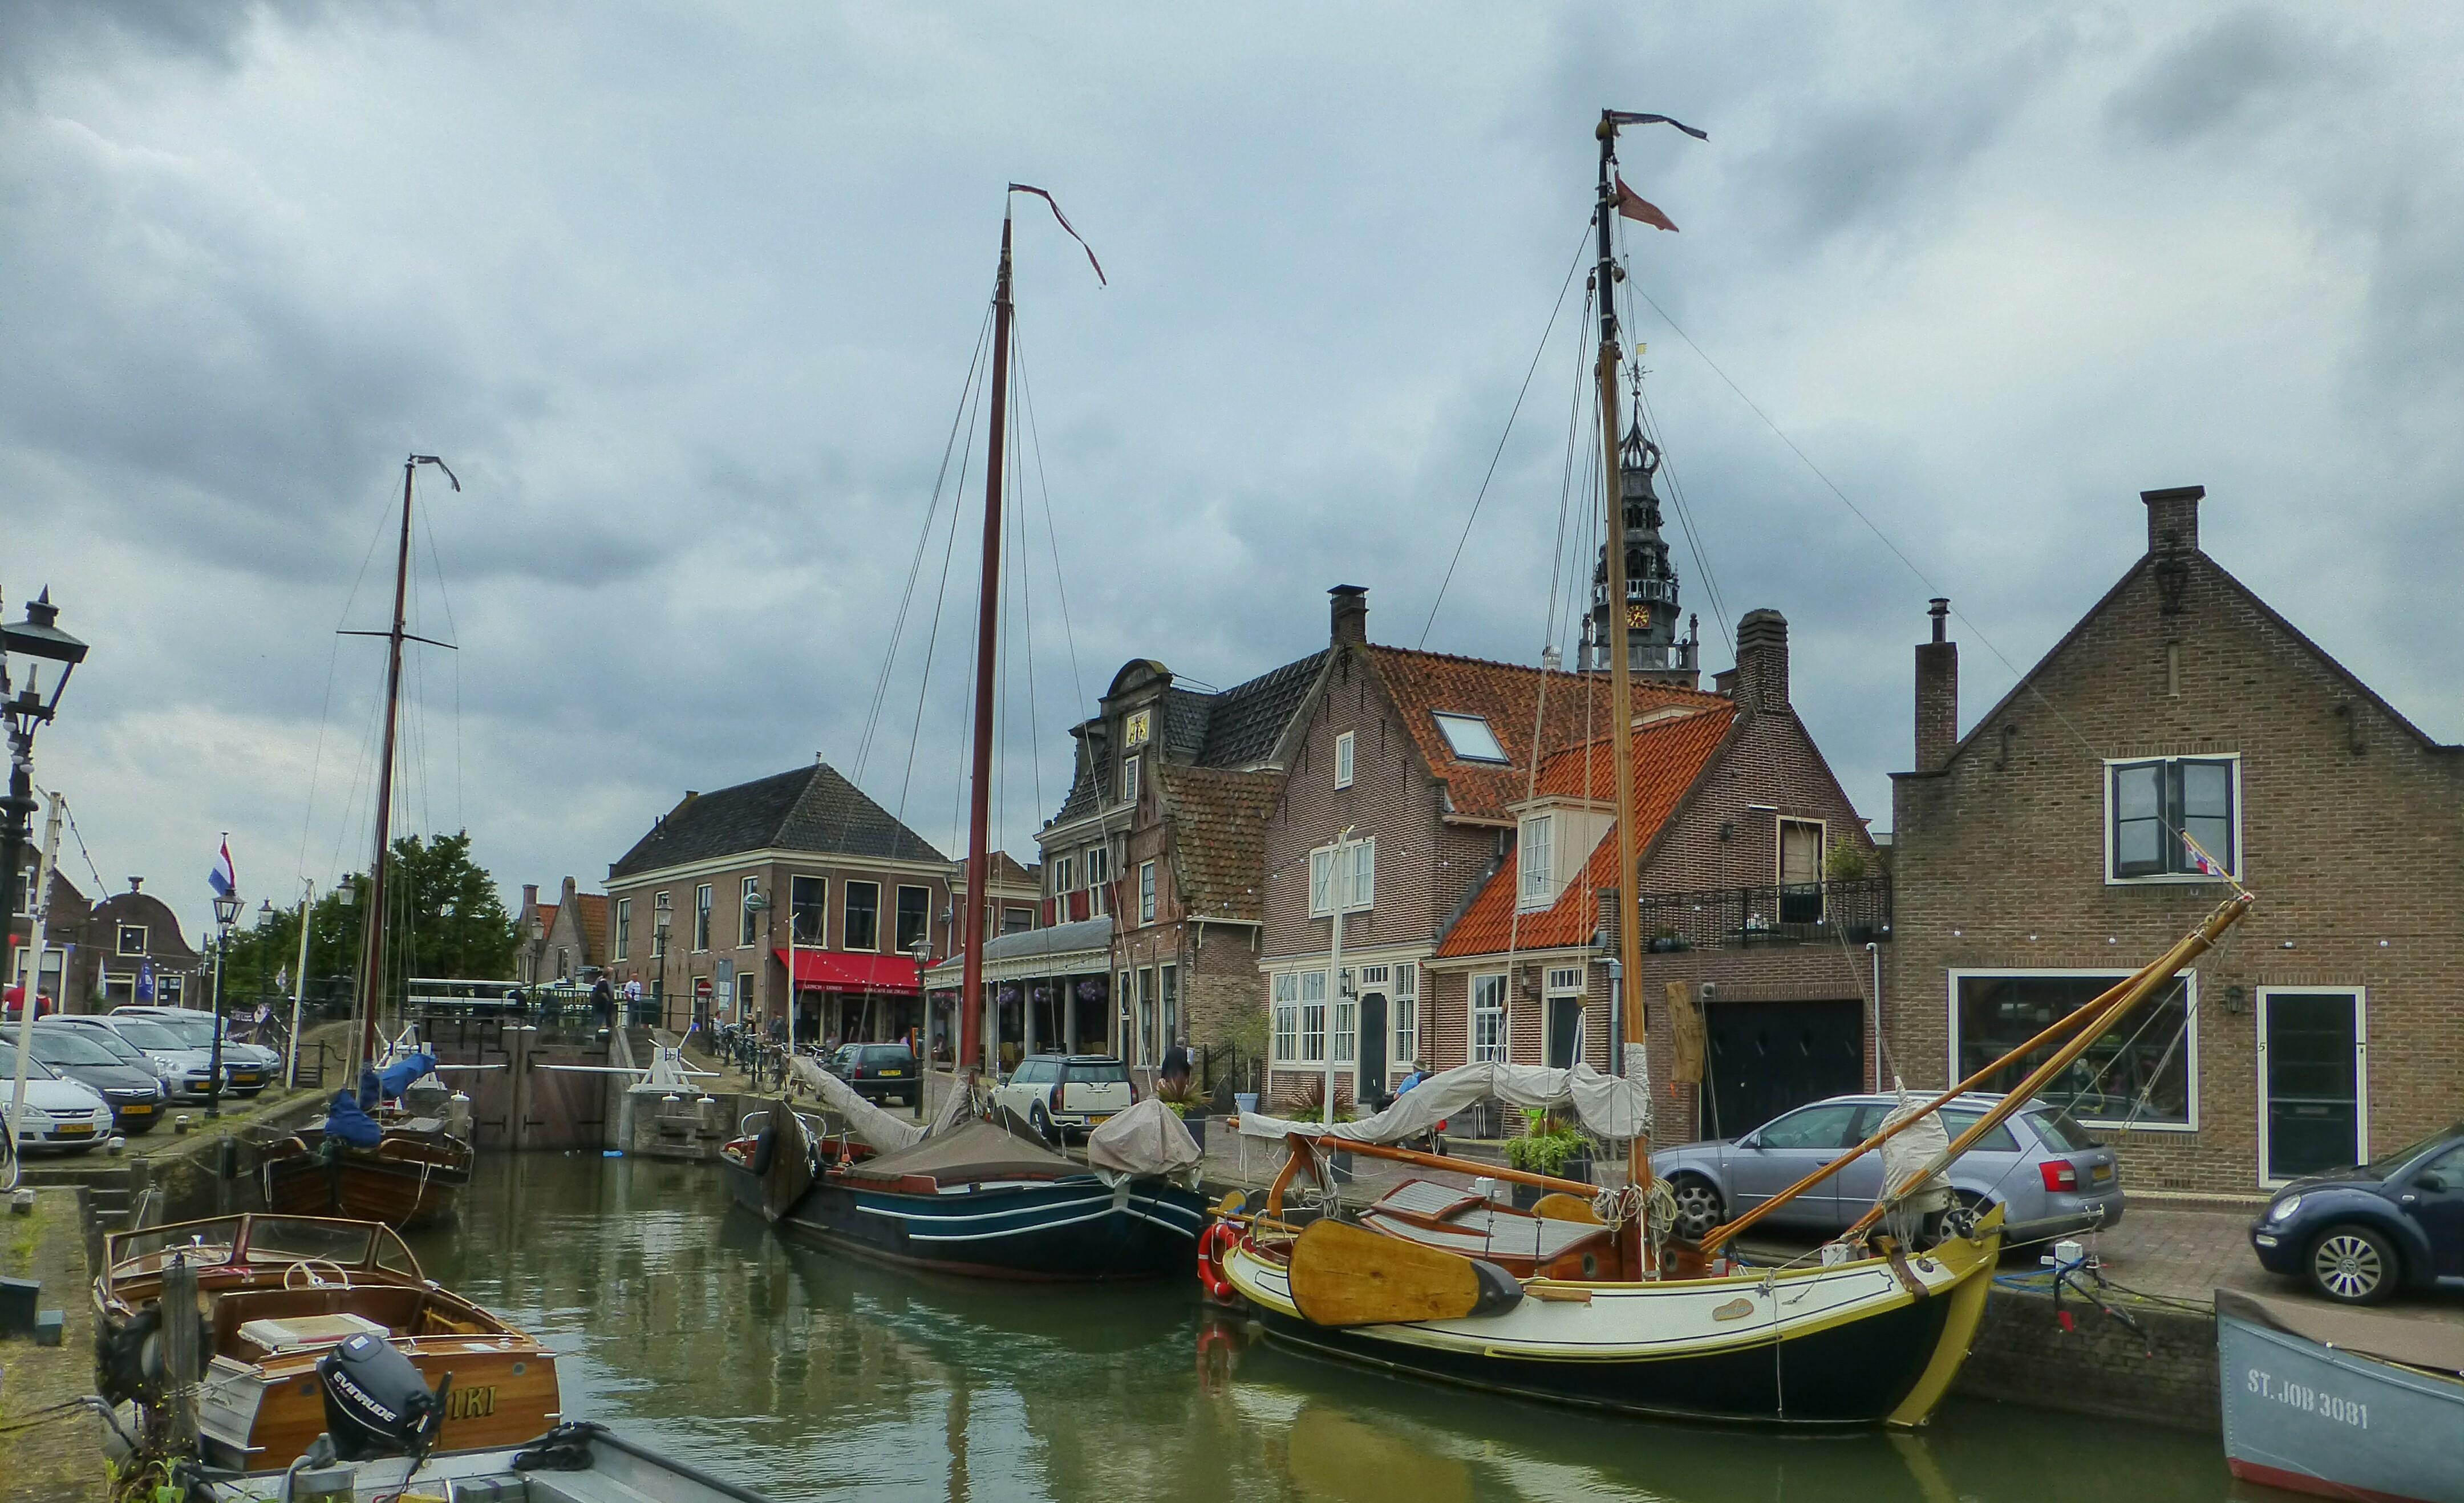 Monnickendam Netherlands